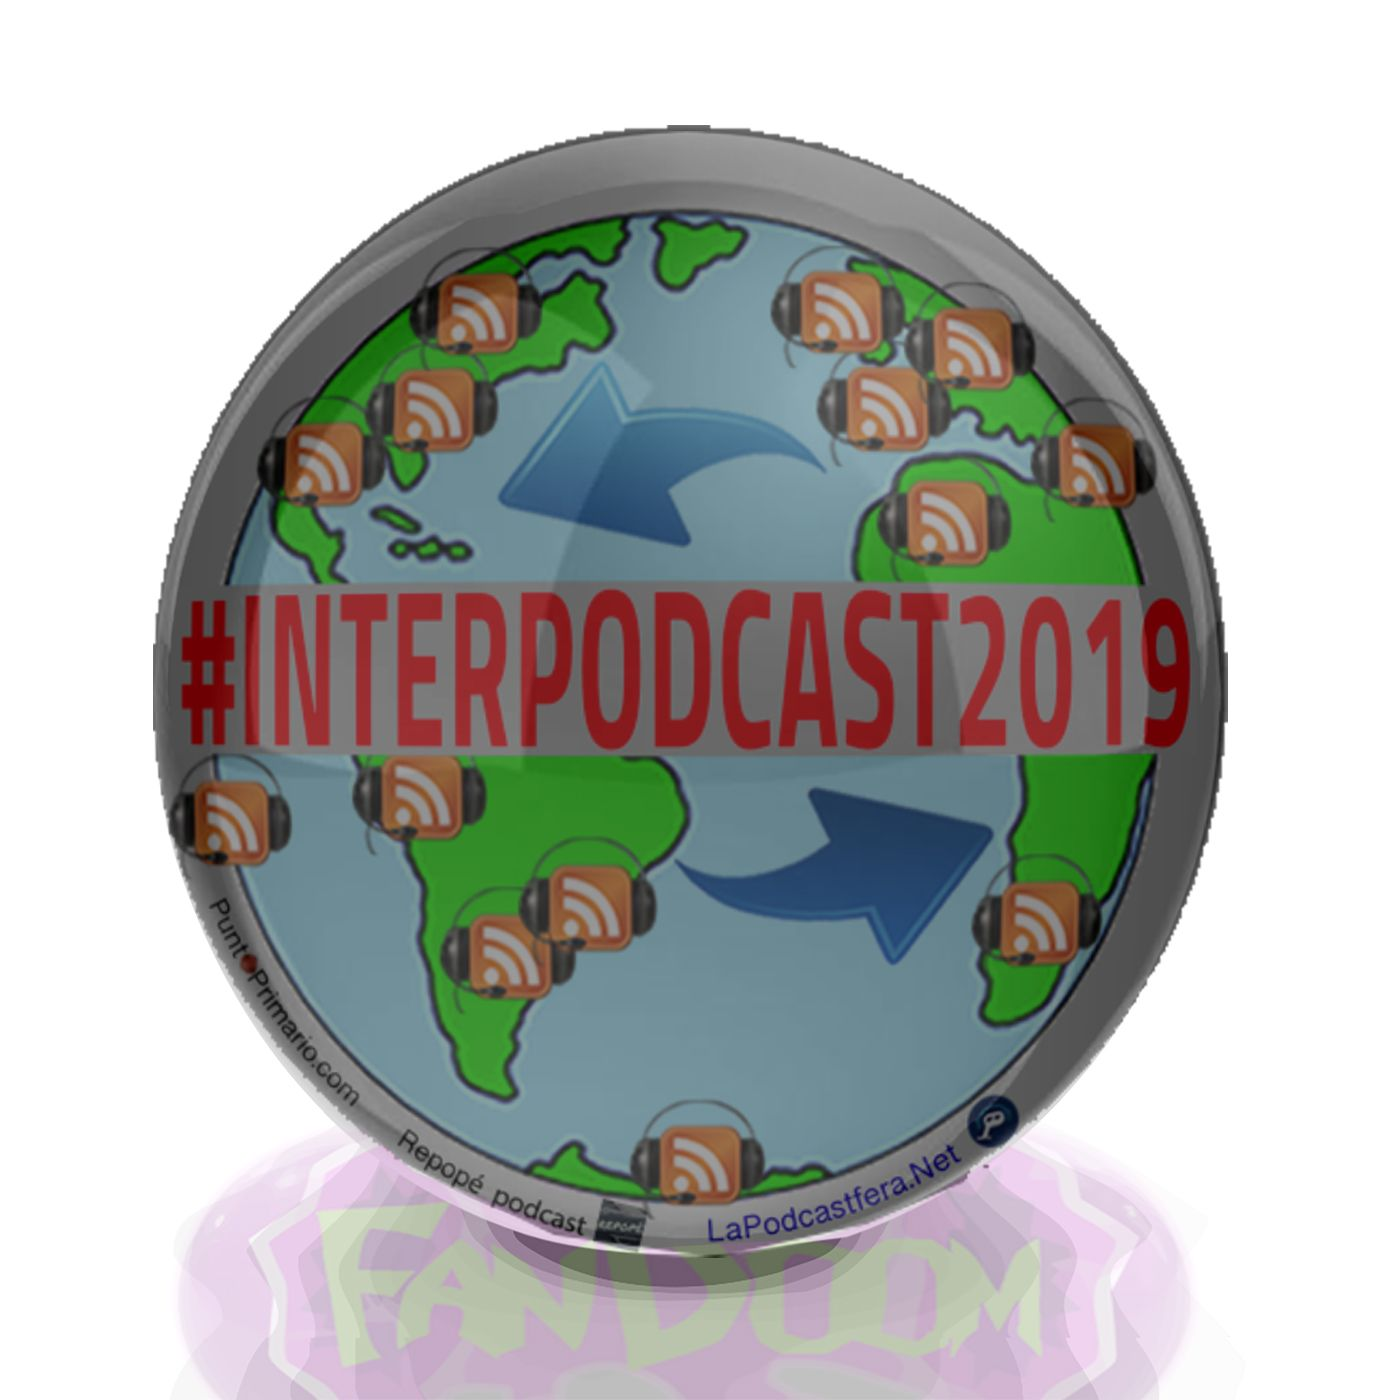 #InterPodcast2019 – FandoomZapp imitando a @PodzappTeam